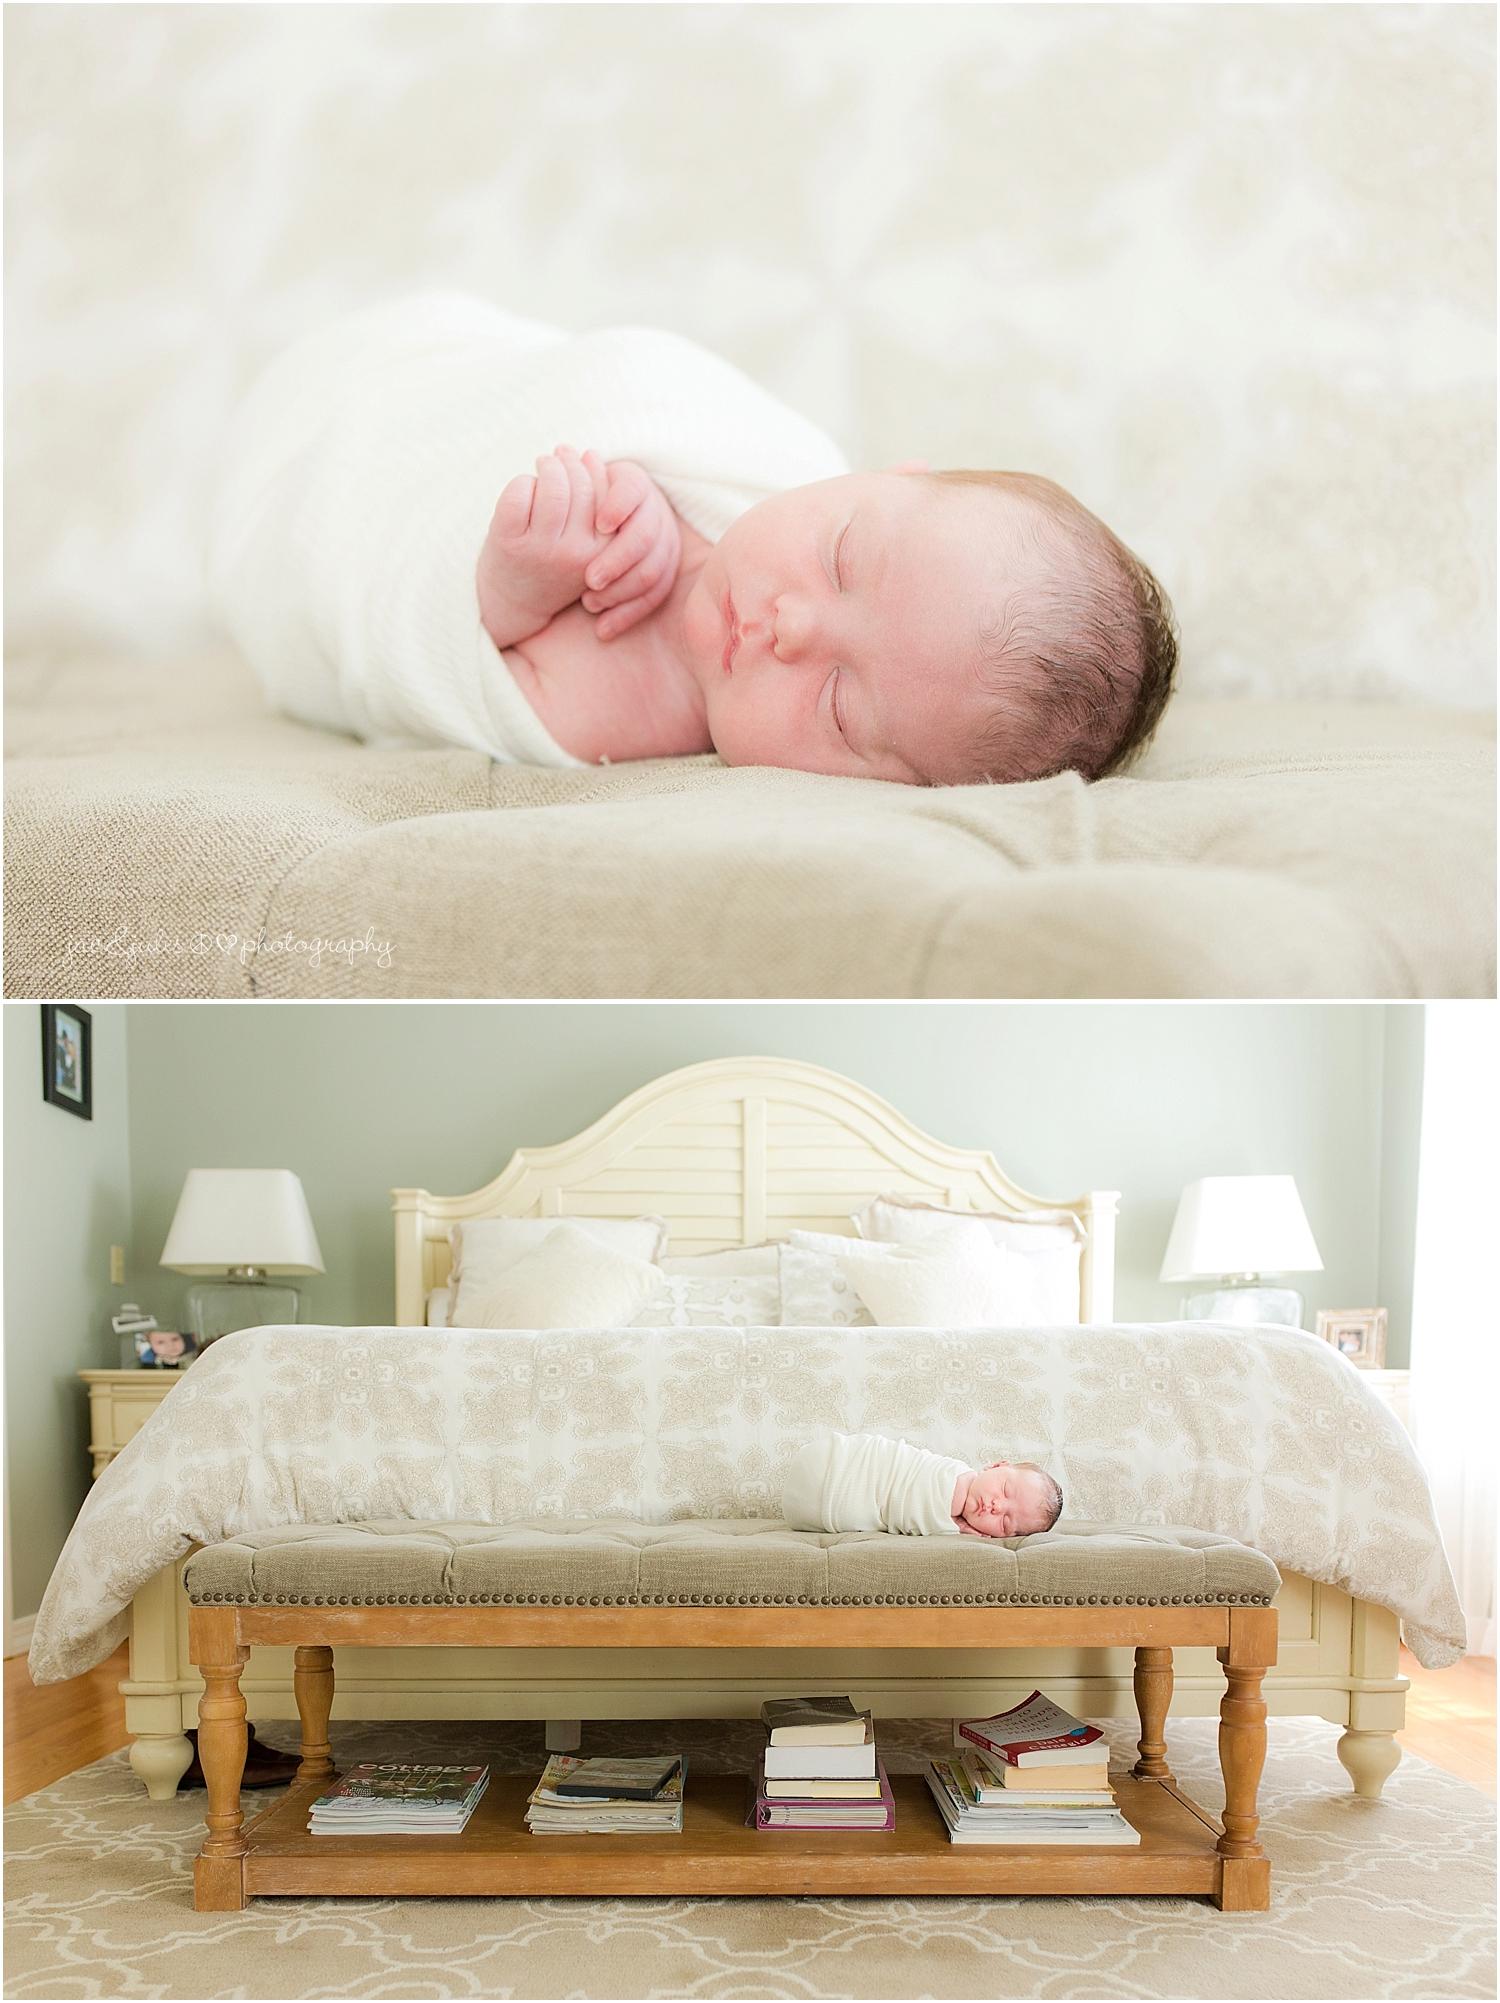 nj newborn photographer jacnjules photographs baby boy at his home